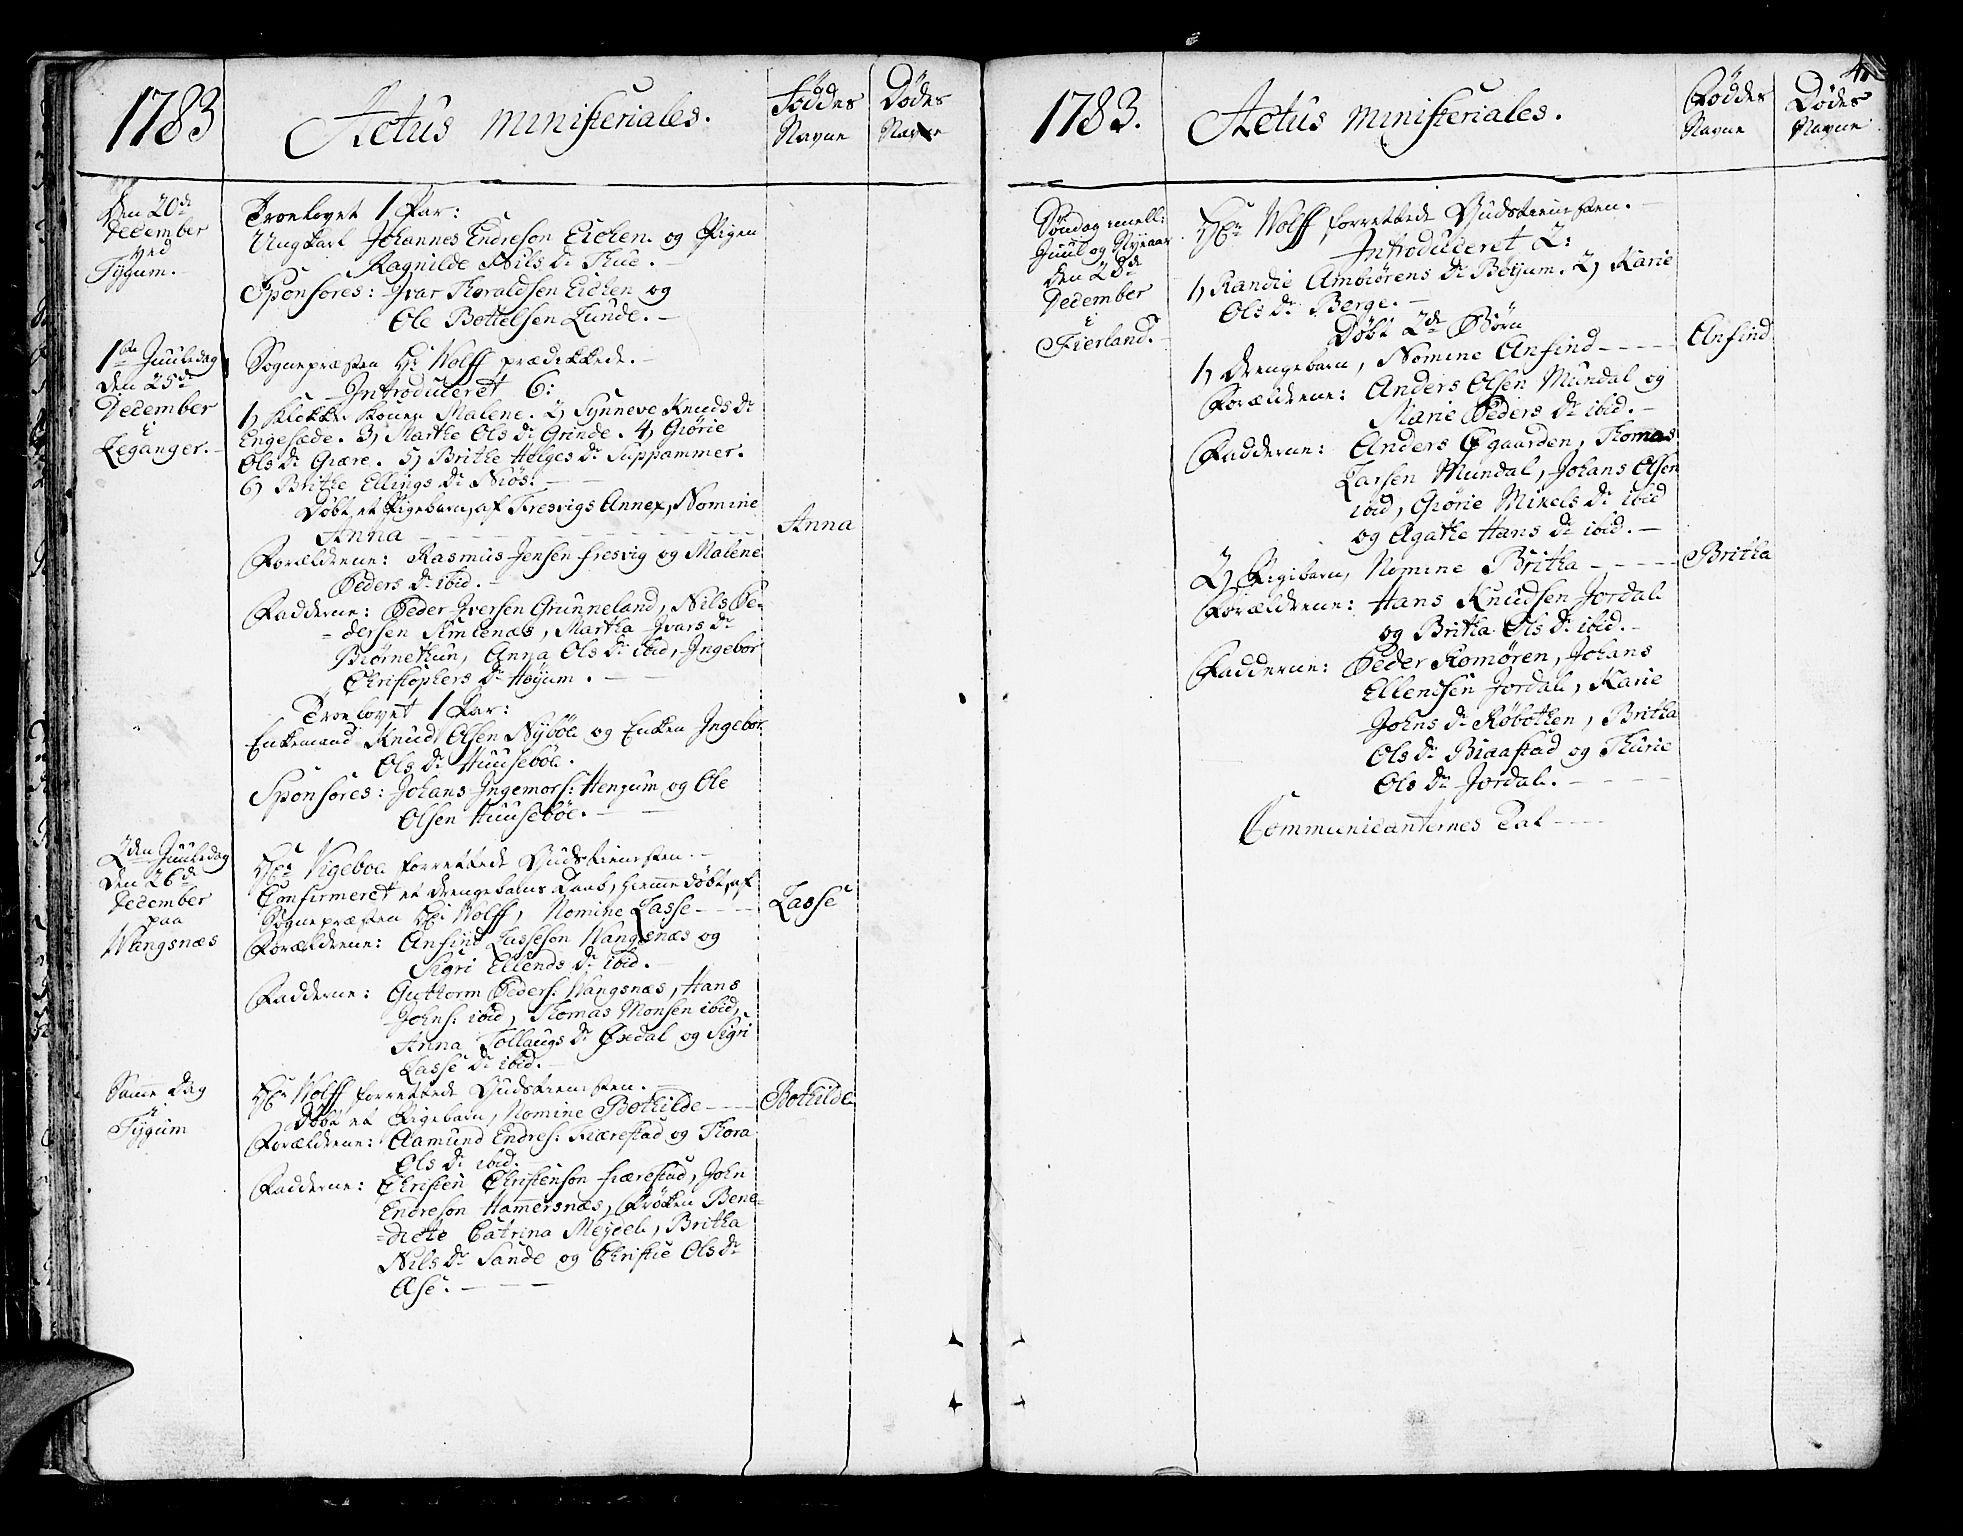 SAB, Leikanger Sokneprestembete, Ministerialbok nr. A 4, 1770-1791, s. 41